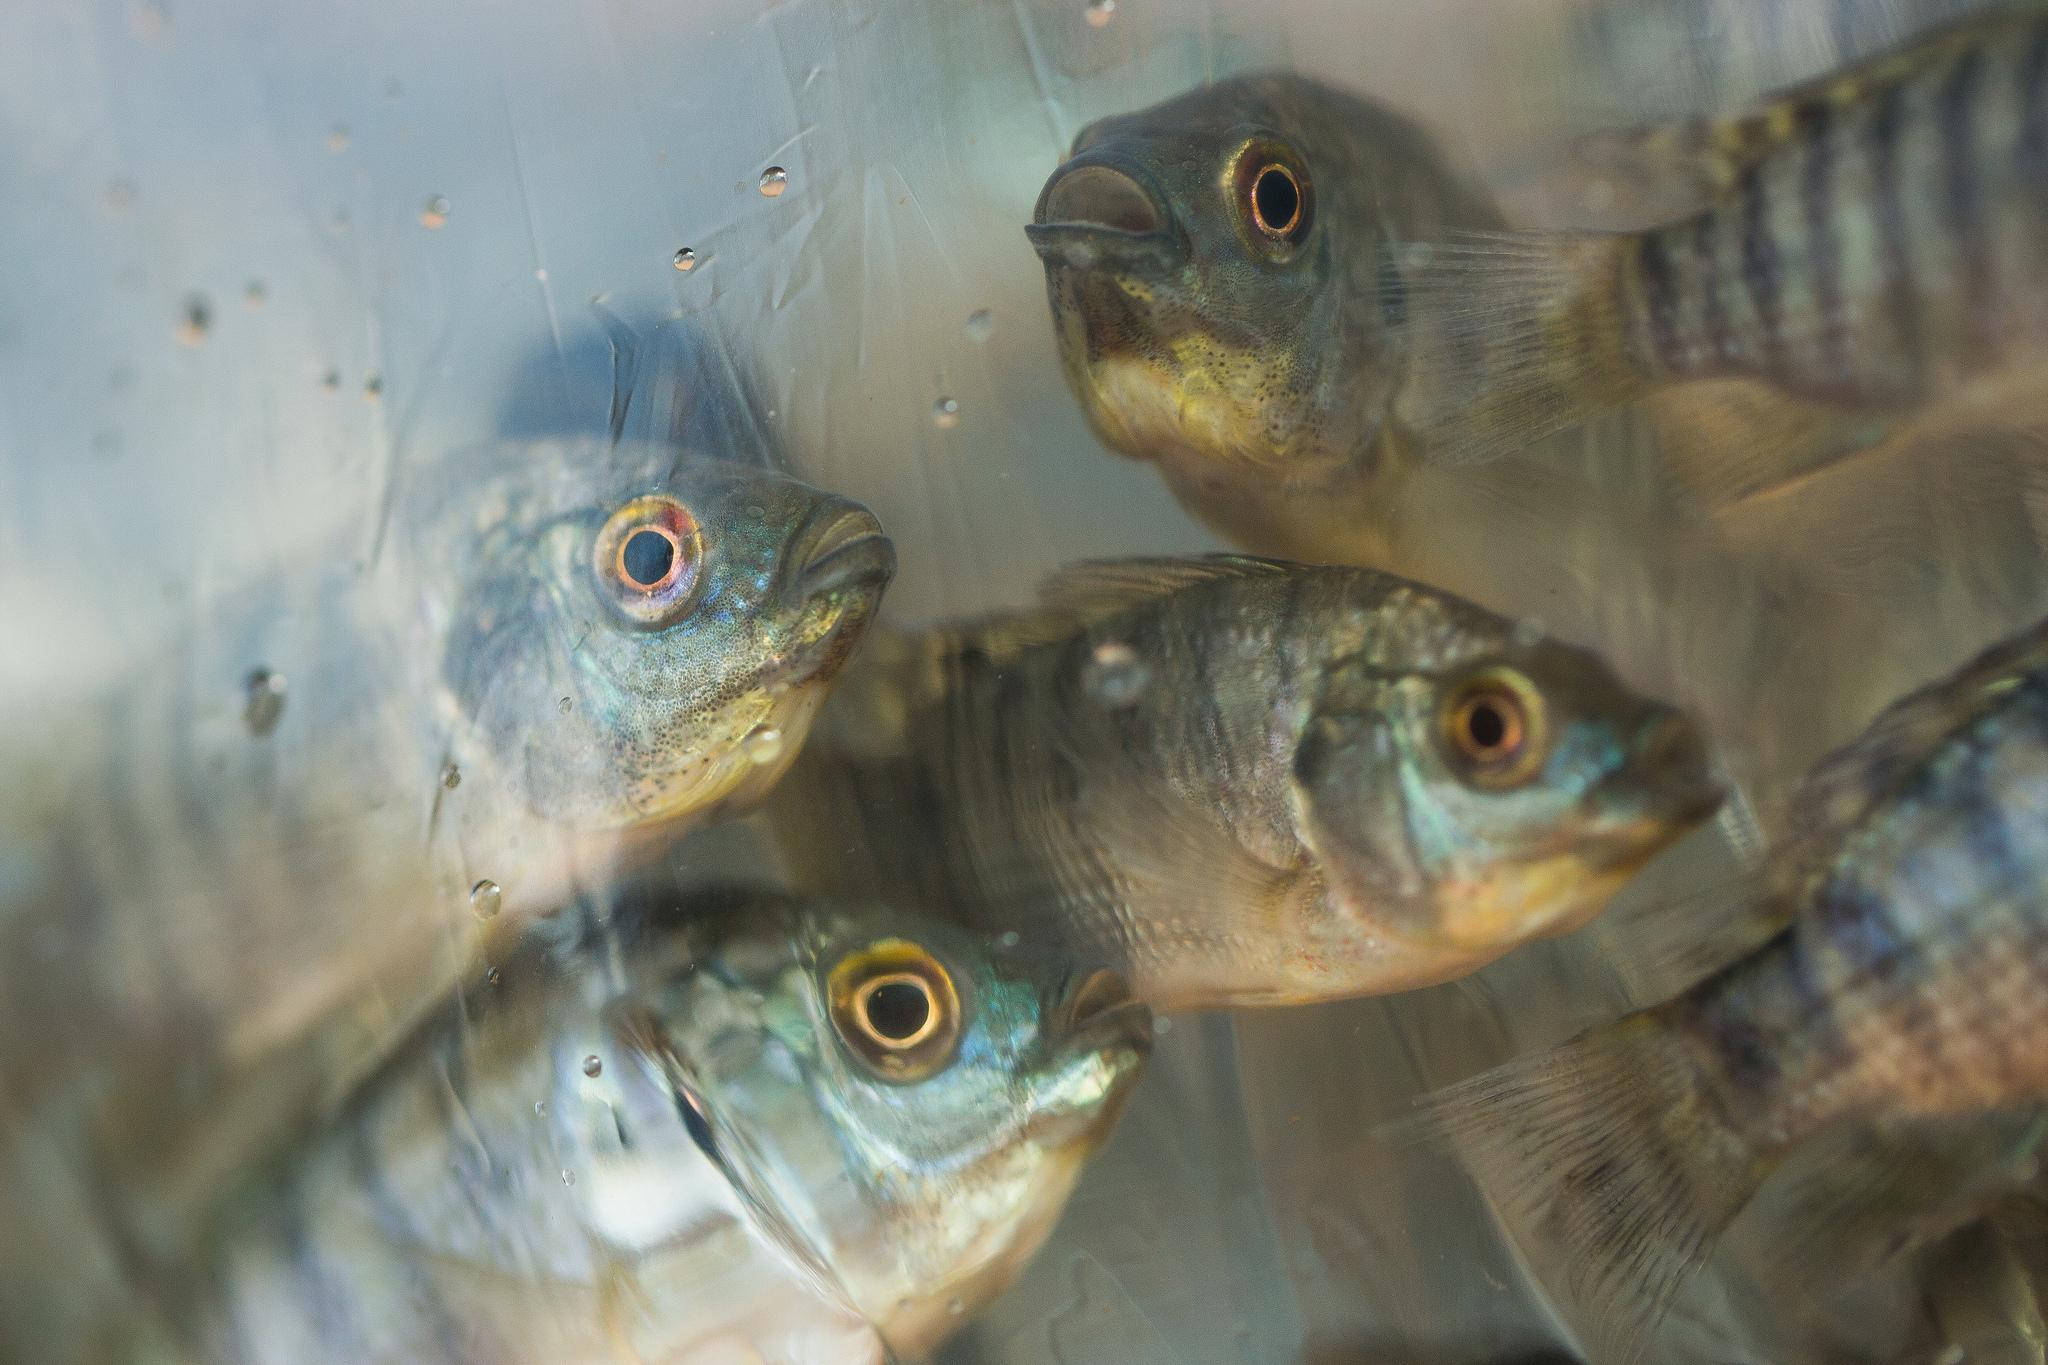 tilápia, piscicultura, peixe, alevino